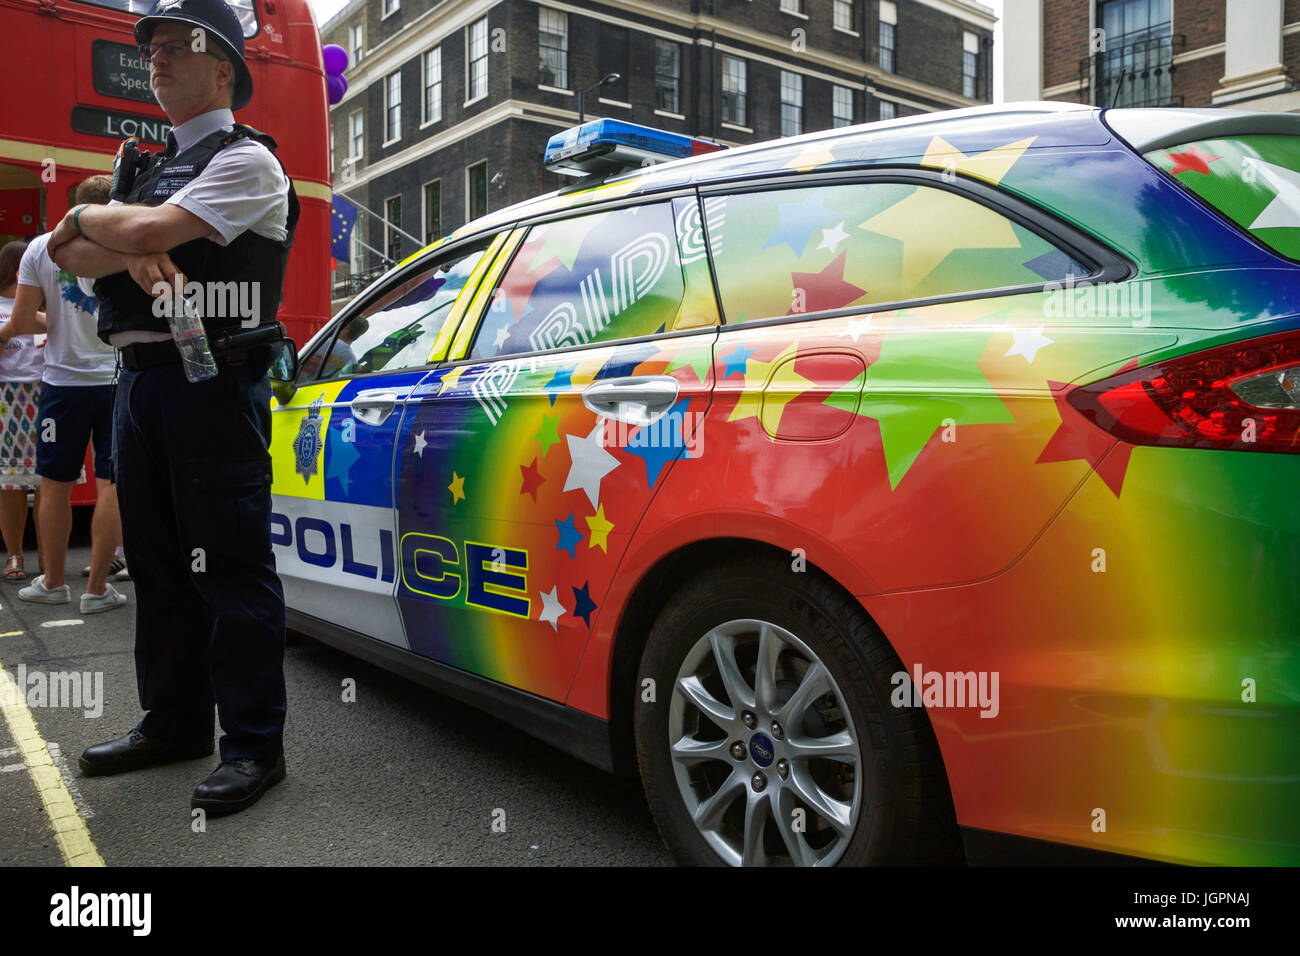 Pride in London. Polizei-Auto in LGBT-Farben bei der London Pride ...